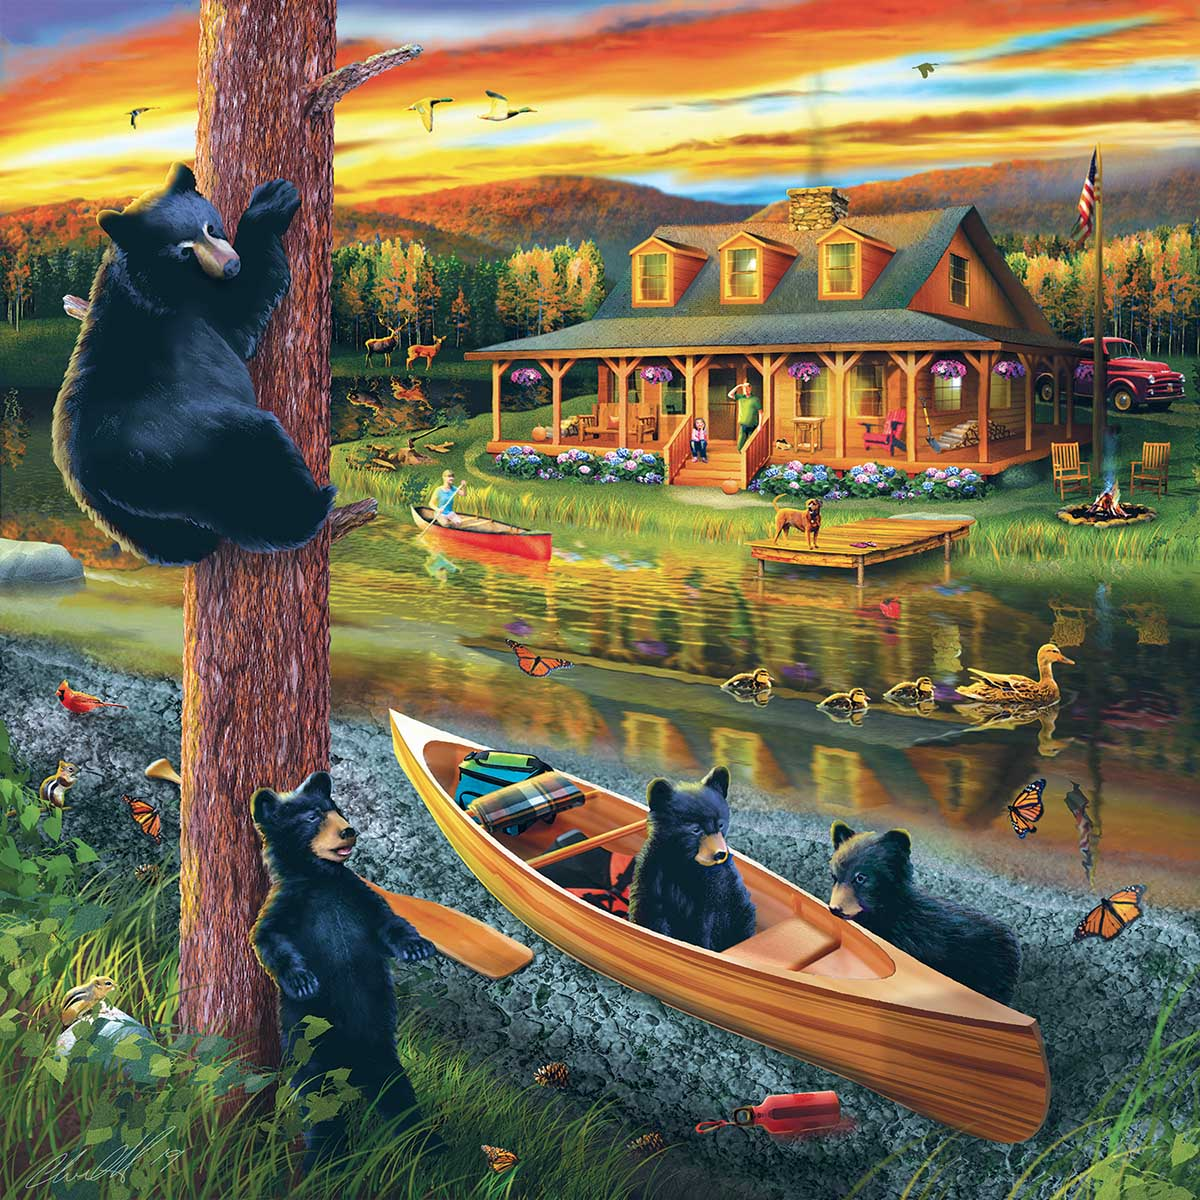 25 Bear Family Adventure Summer Jigsaw Puzzle